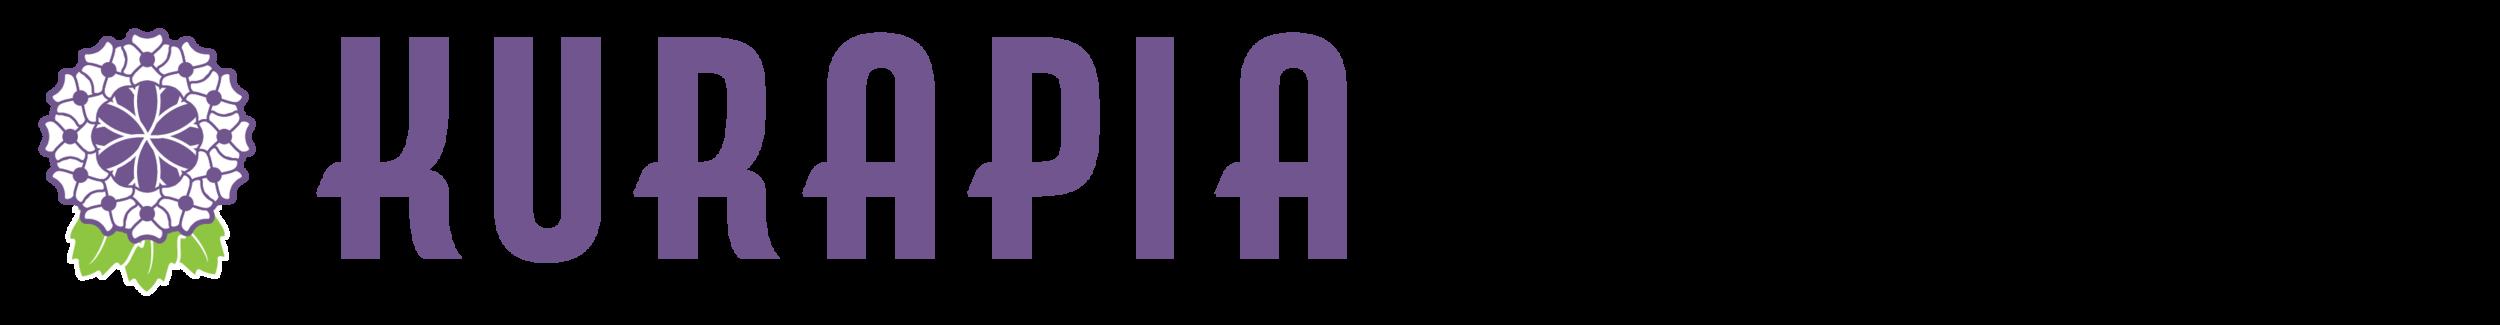 KD_Logo_Long-12.png